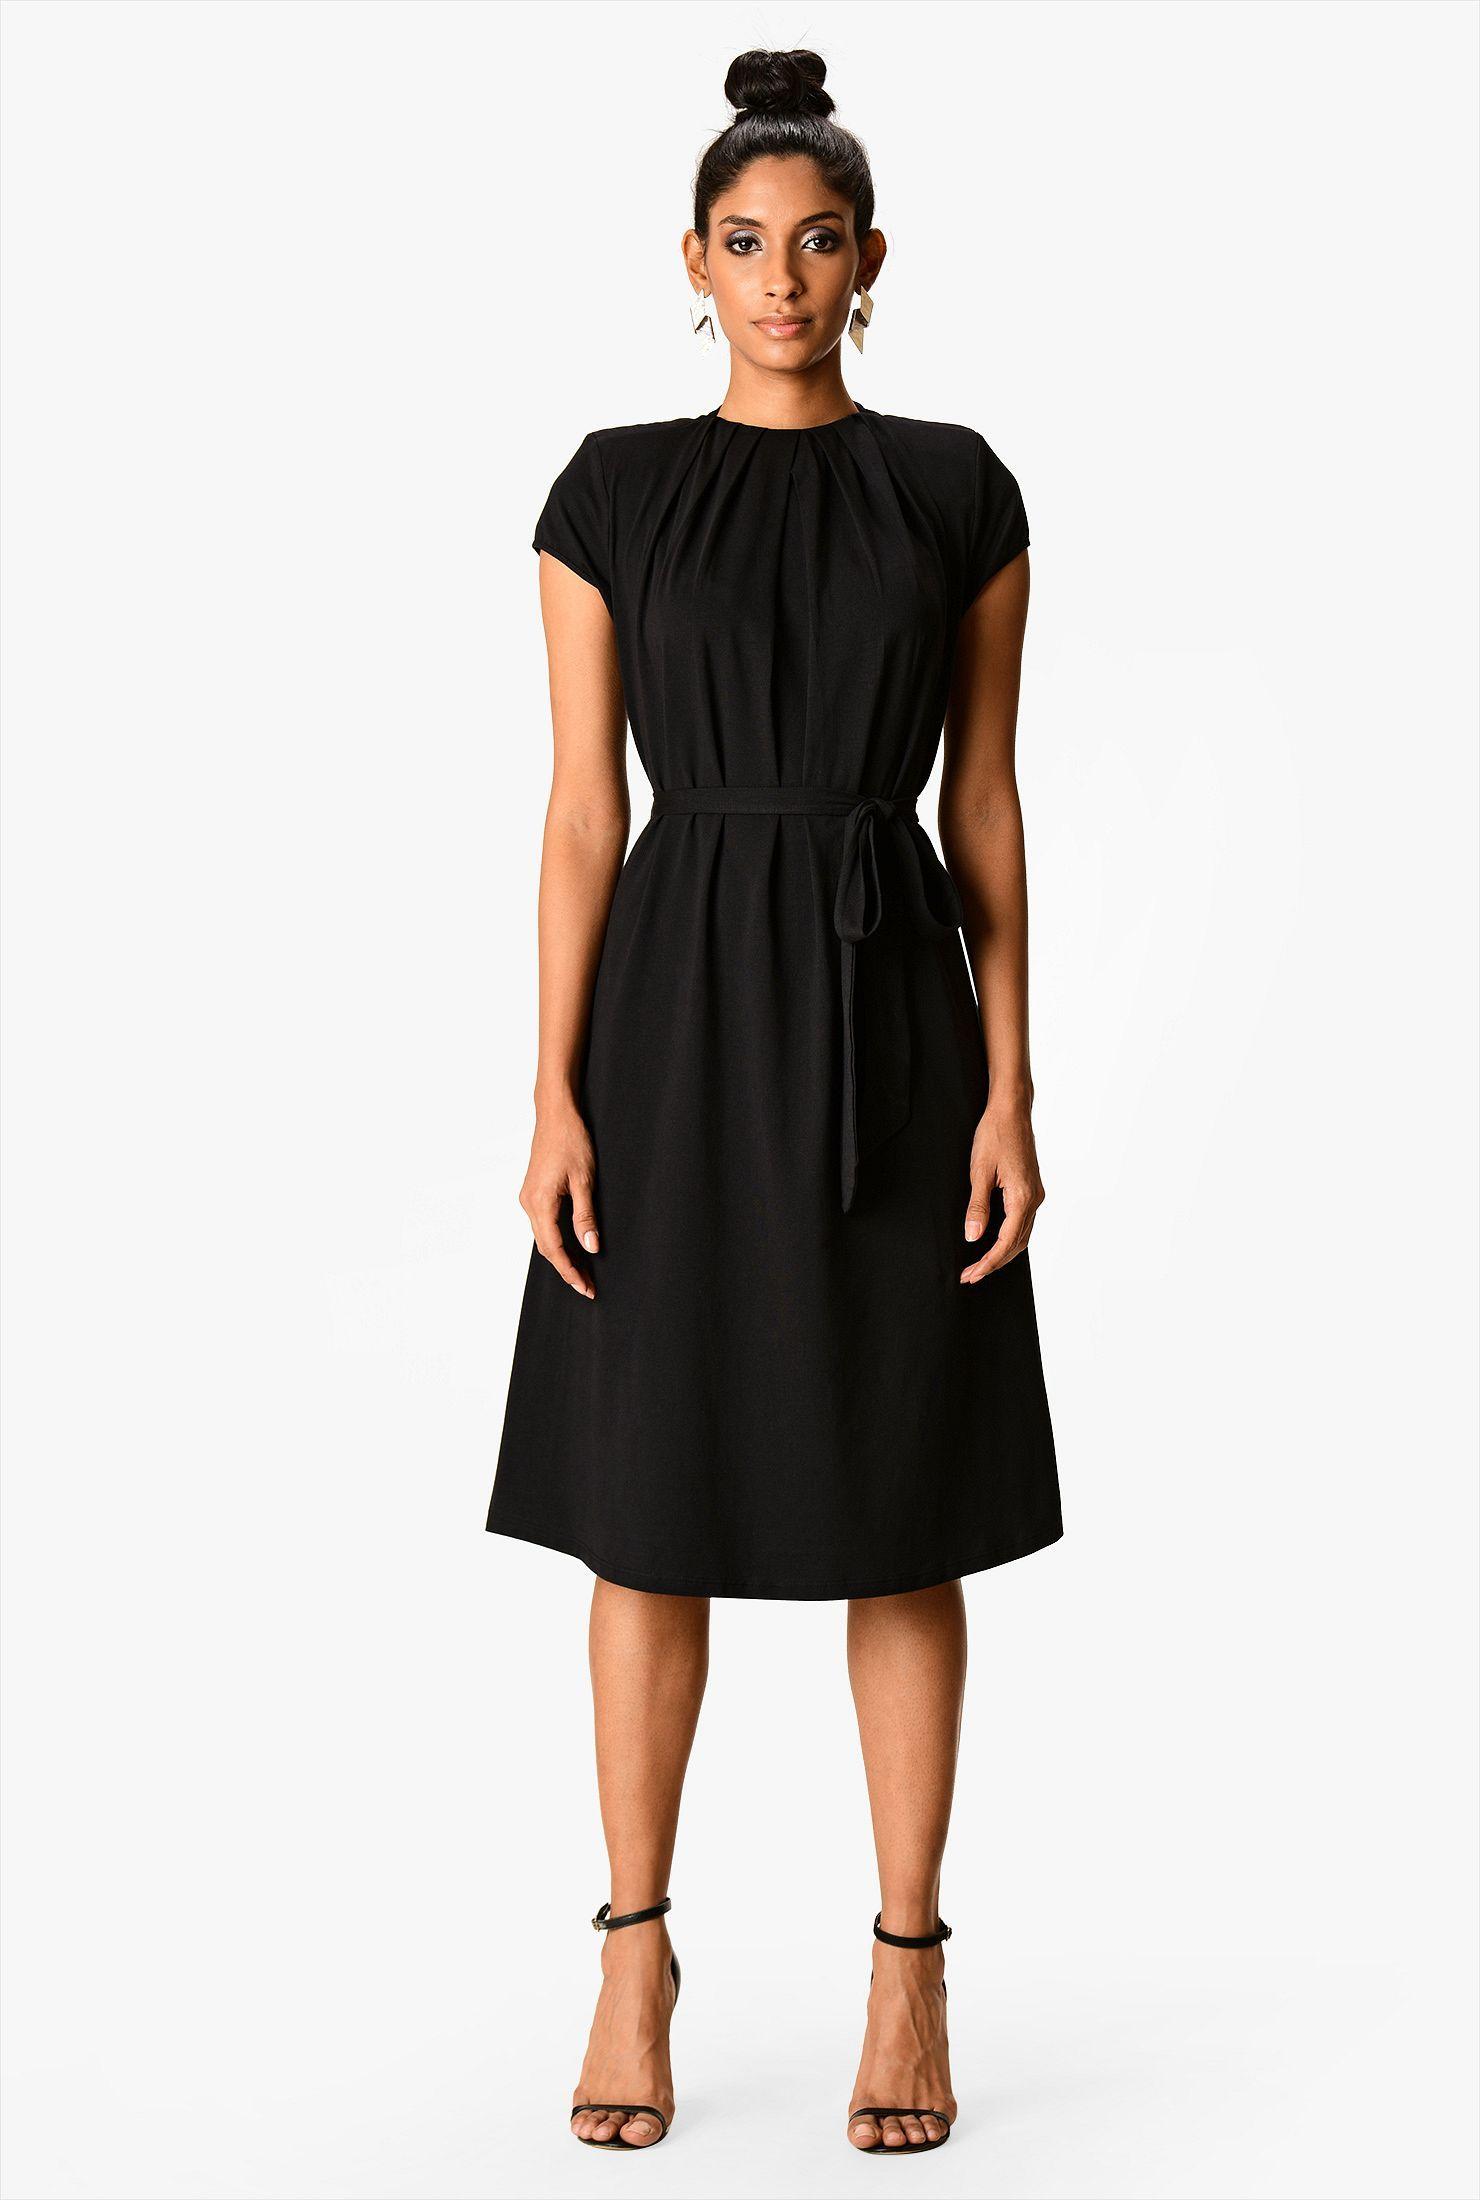 Cute Black Dress Simple Black Dress Knit Shift Dress Cheap Black Dress [ 2200 x 1480 Pixel ]